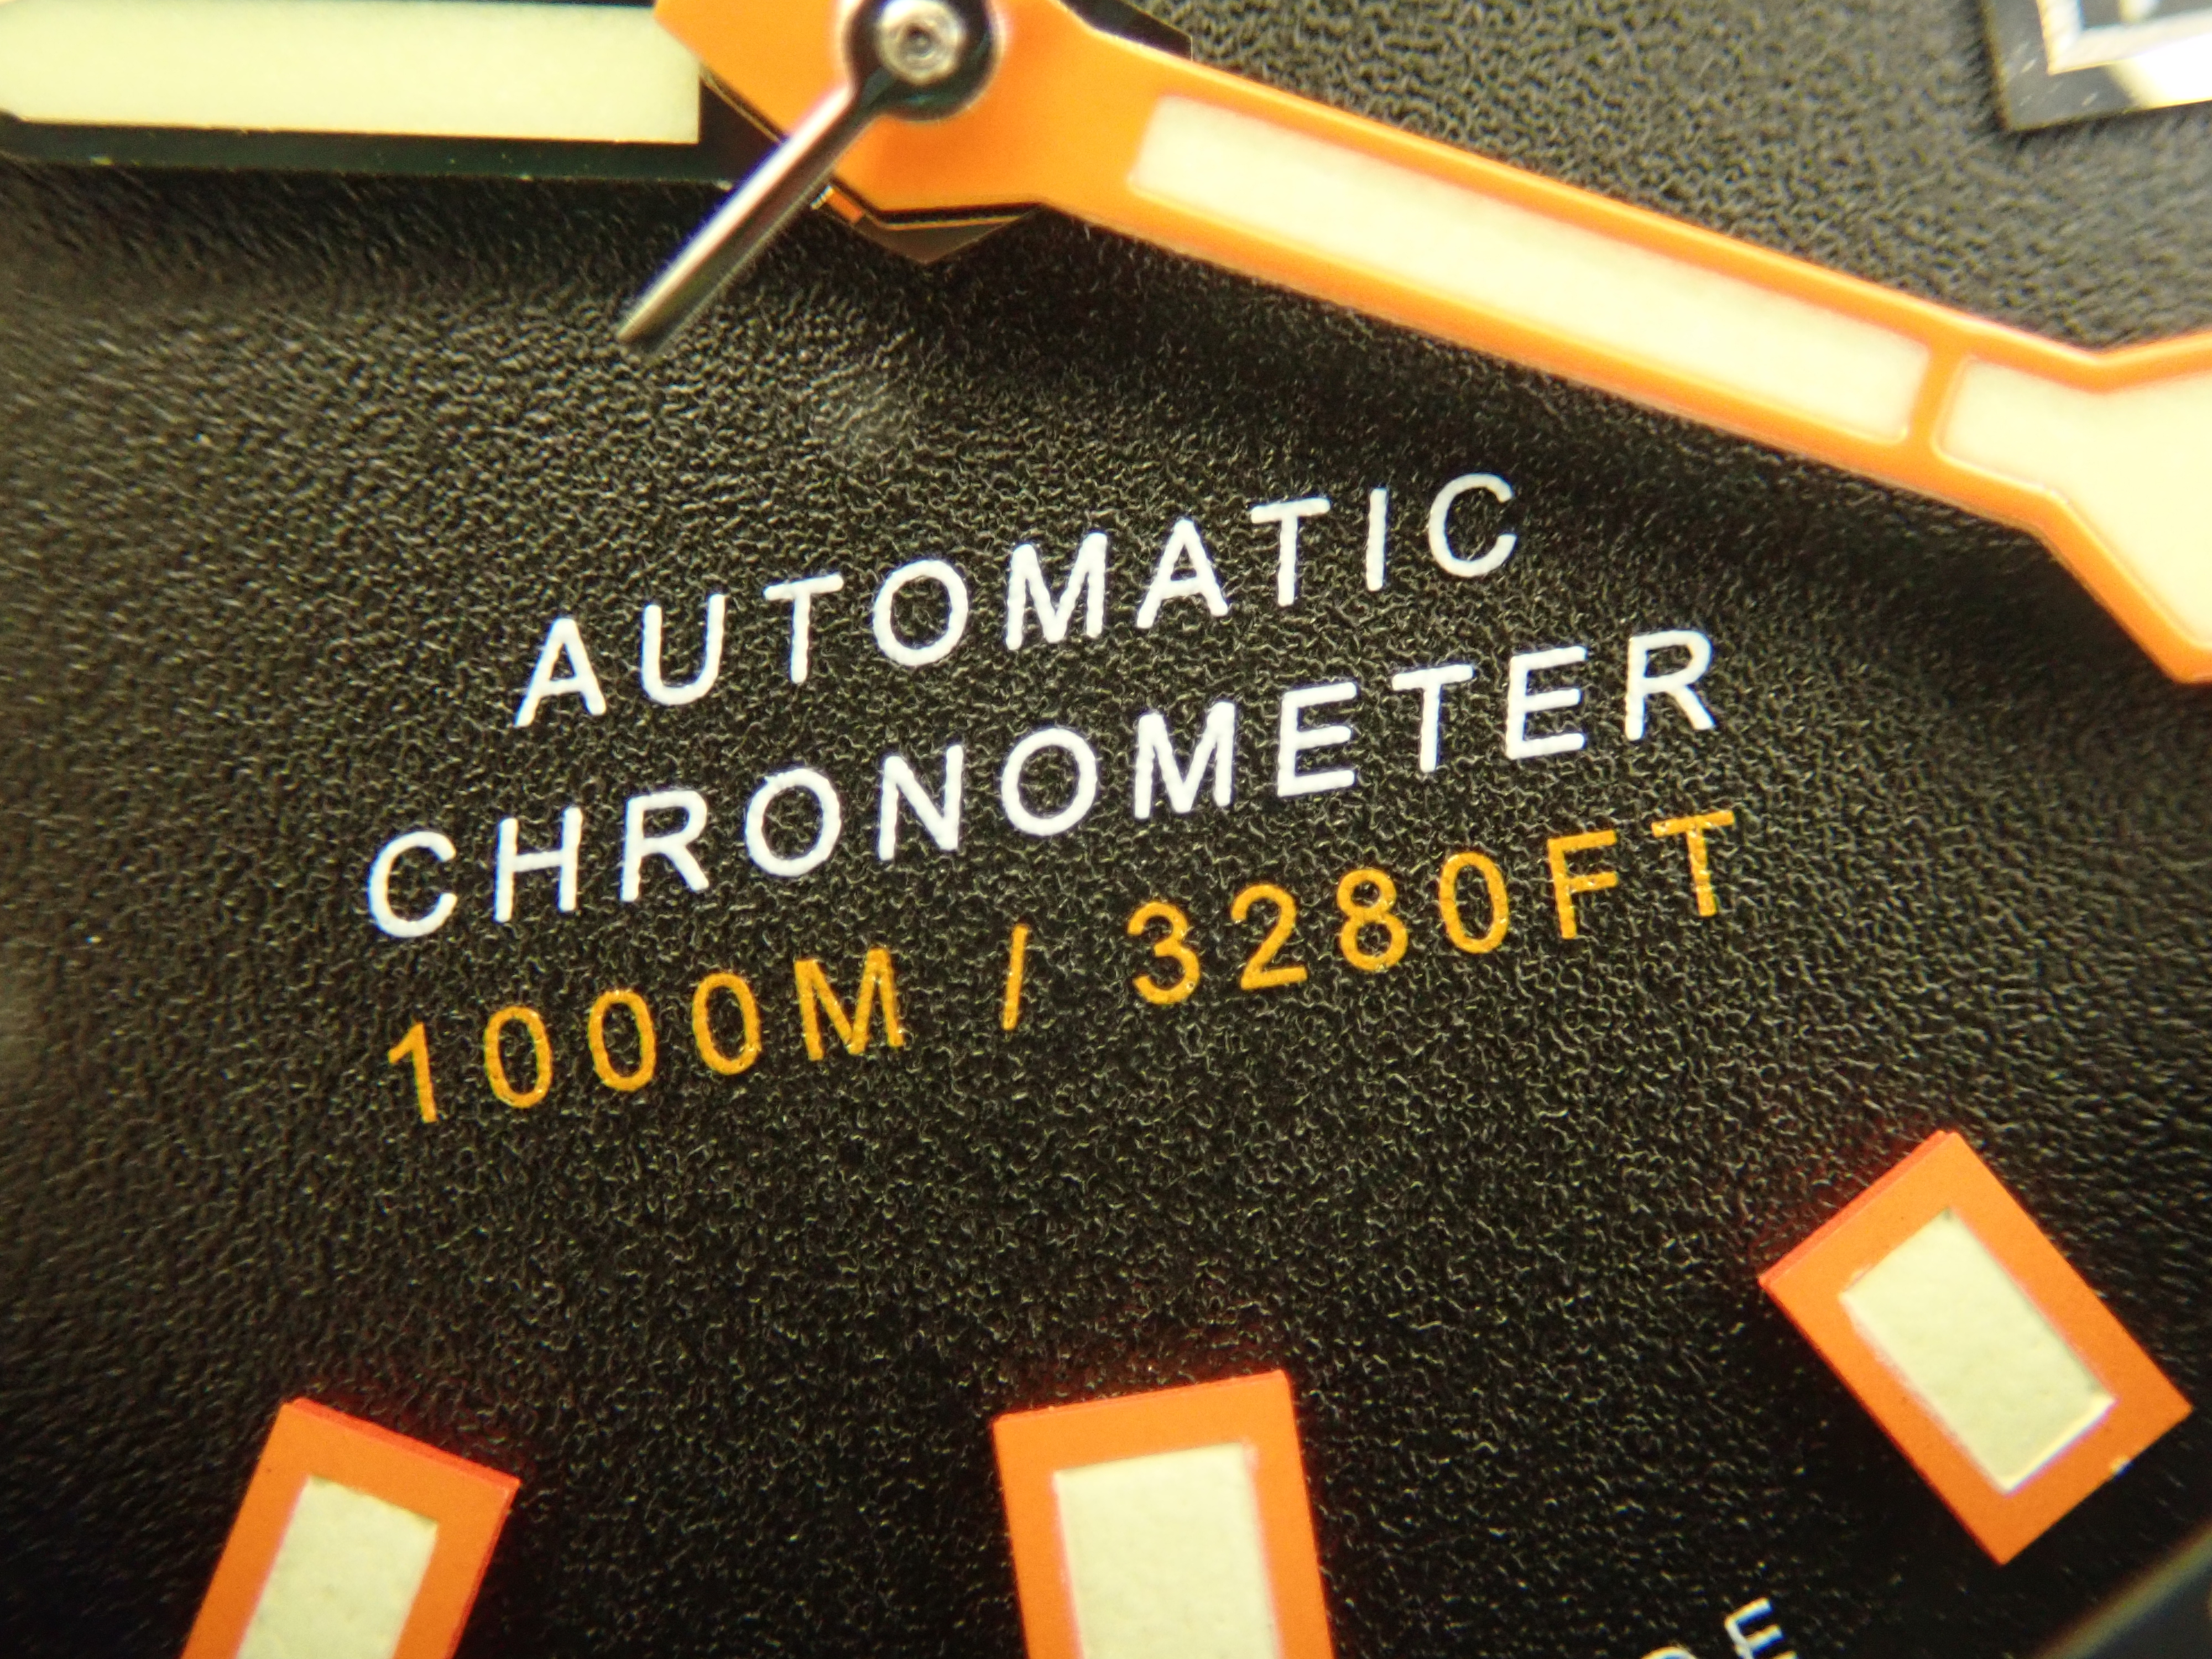 LG-1を使用。1/60秒 / F3 / -0.7EV / ISO800 / 8.4mm